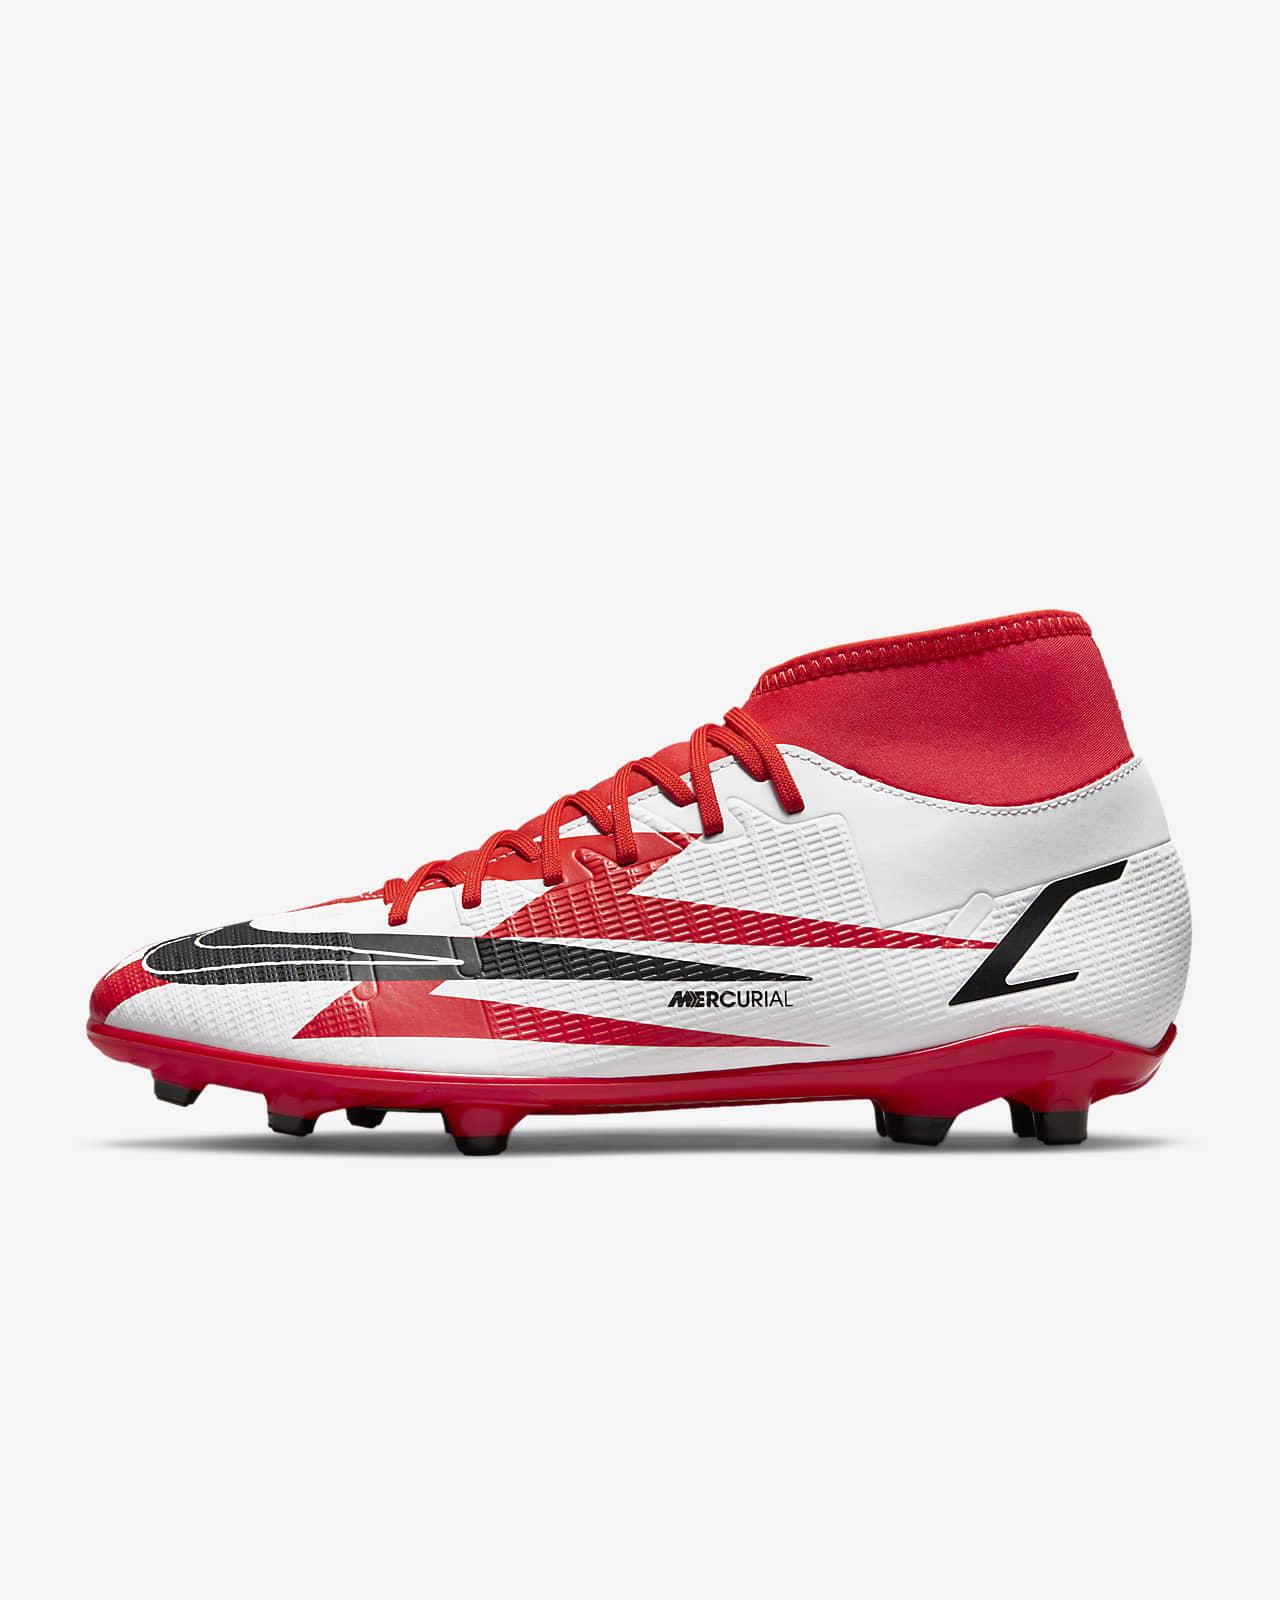 Calzado de fútbol para múltiples superficies Nike Mercurial Superfly 8 Club CR7 MG